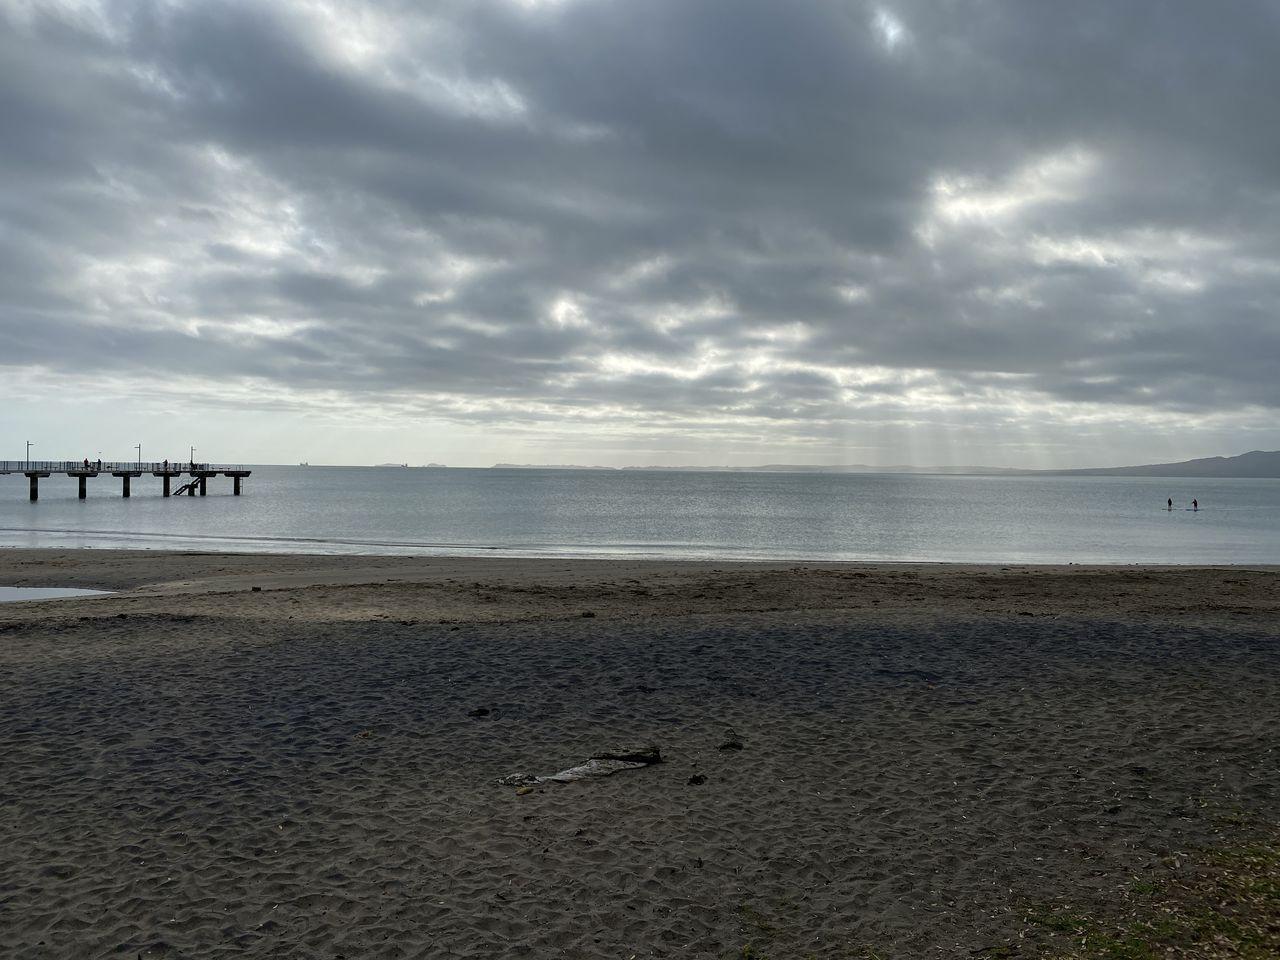 sea, beach, water, sky, land, cloud - sky, sand, scenics - nature, beauty in nature, horizon over water, horizon, tranquil scene, tranquility, nature, non-urban scene, idyllic, day, outdoors